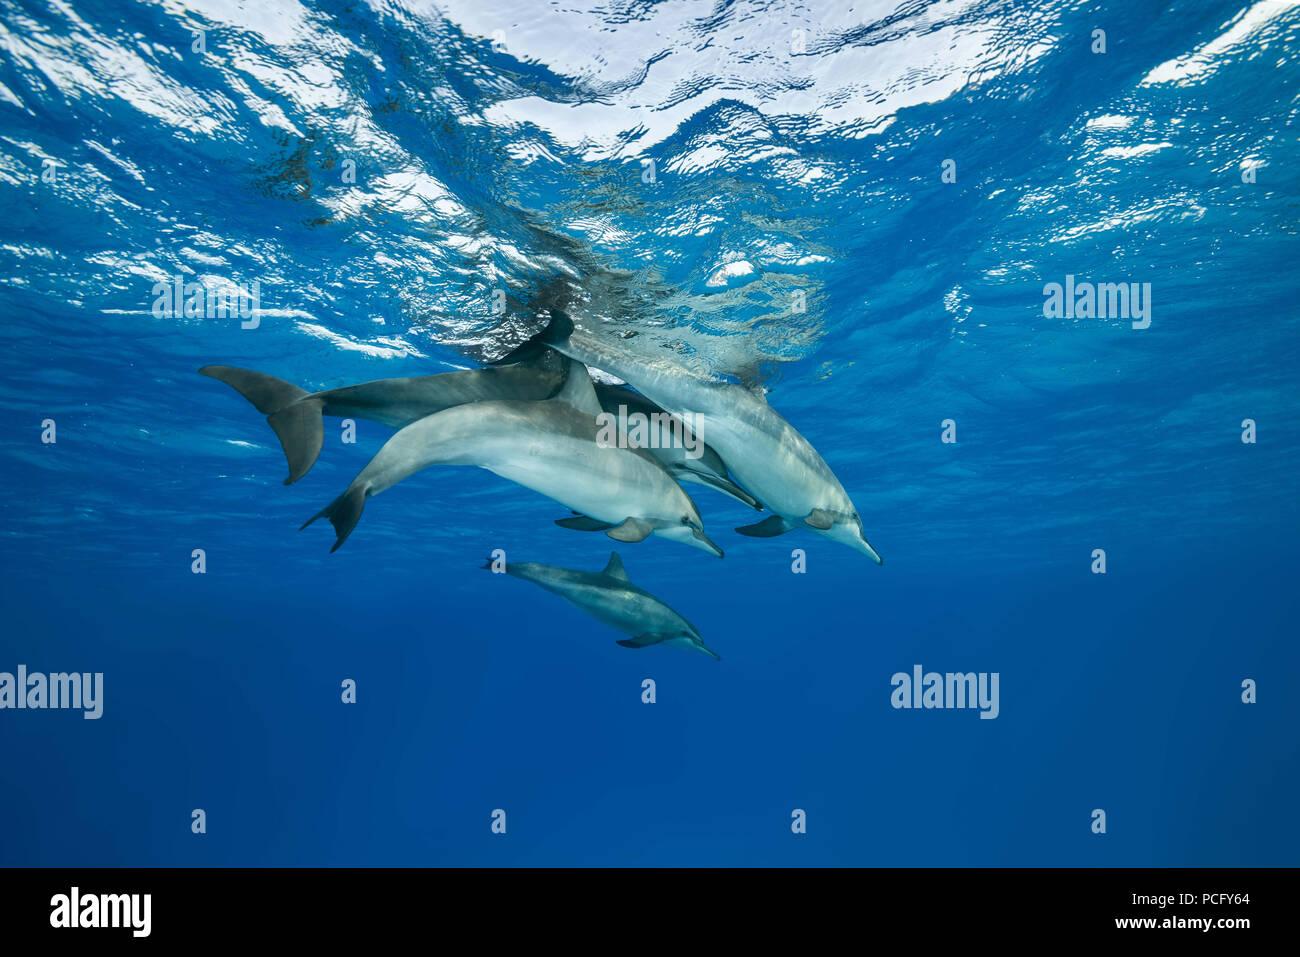 August 2, 2018 - Red Sea, Sataya Reef, Marsa Alam, Egypt, Africa - Family of Spinner Dolphins (Stenella longirostris) swim under surface of water (Credit Image: © Andrey Nekrasov/ZUMA Wire/ZUMAPRESS.com) Stock Photo